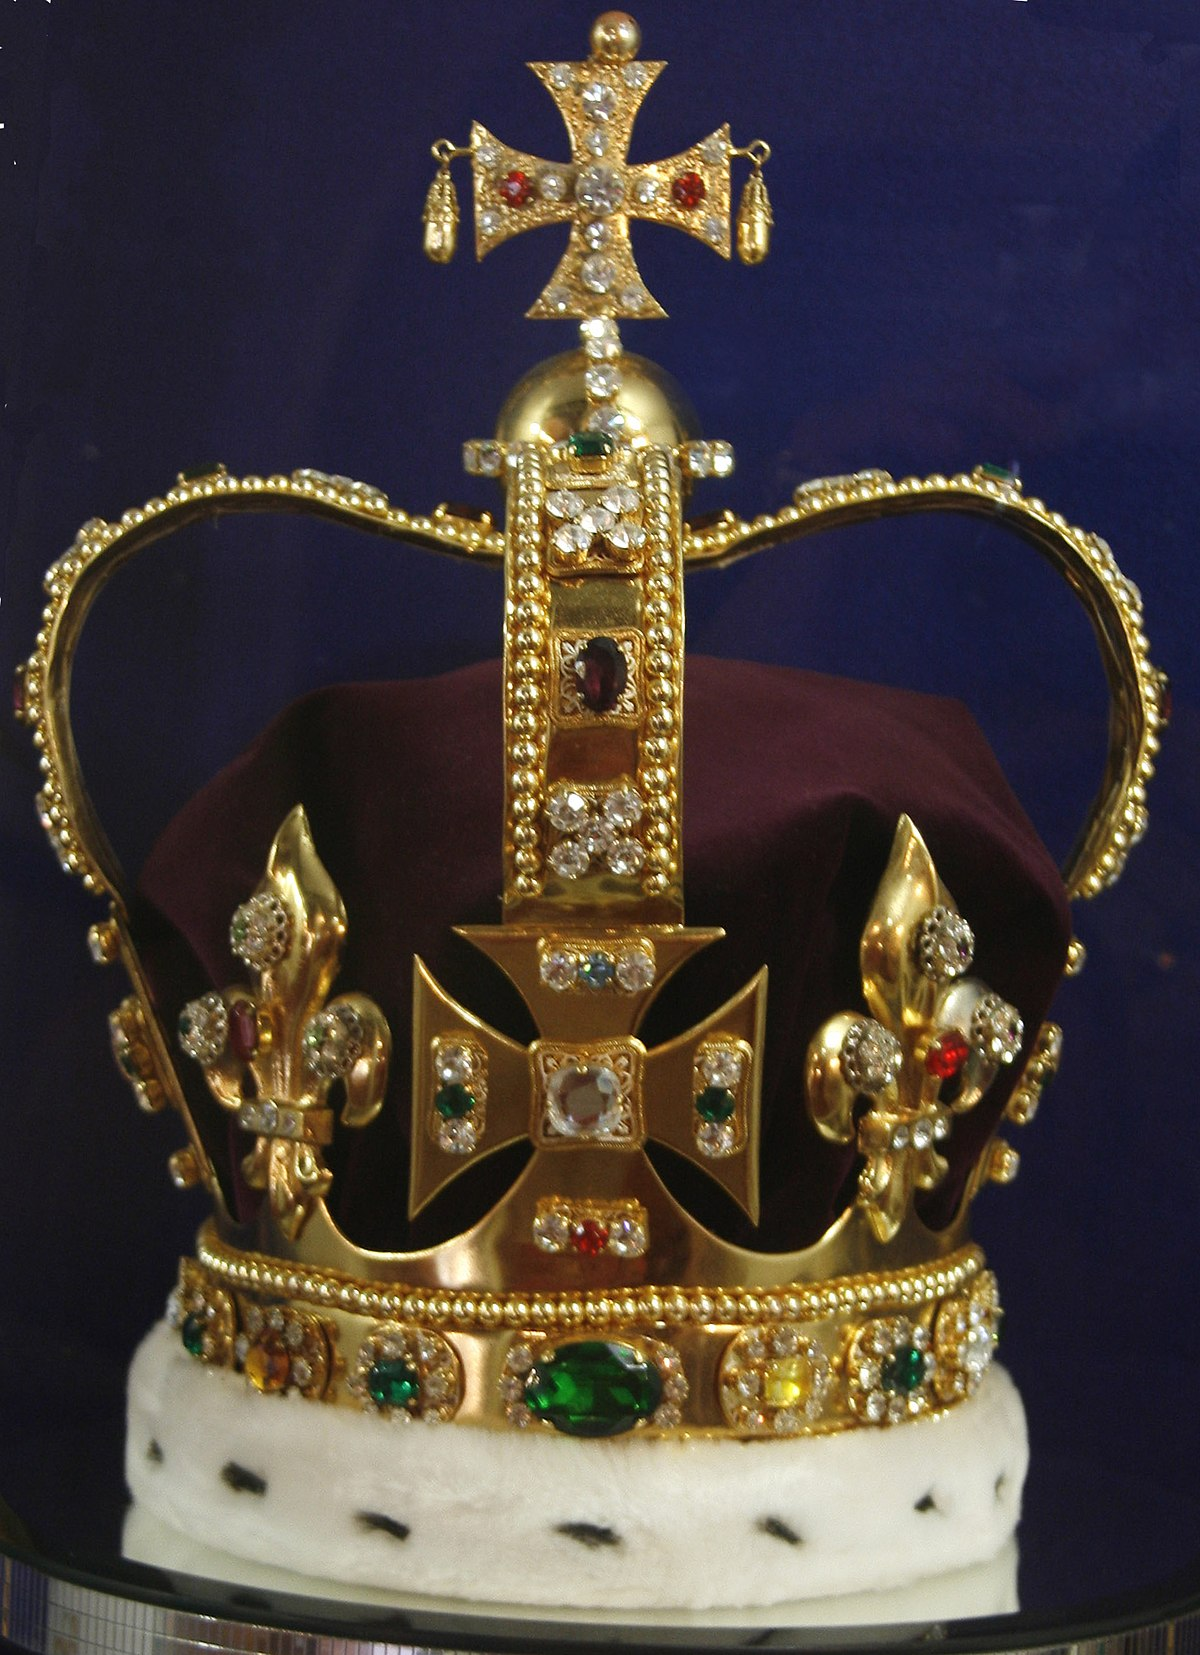 Kroon van sint eduard wikipedia for Englisch krone